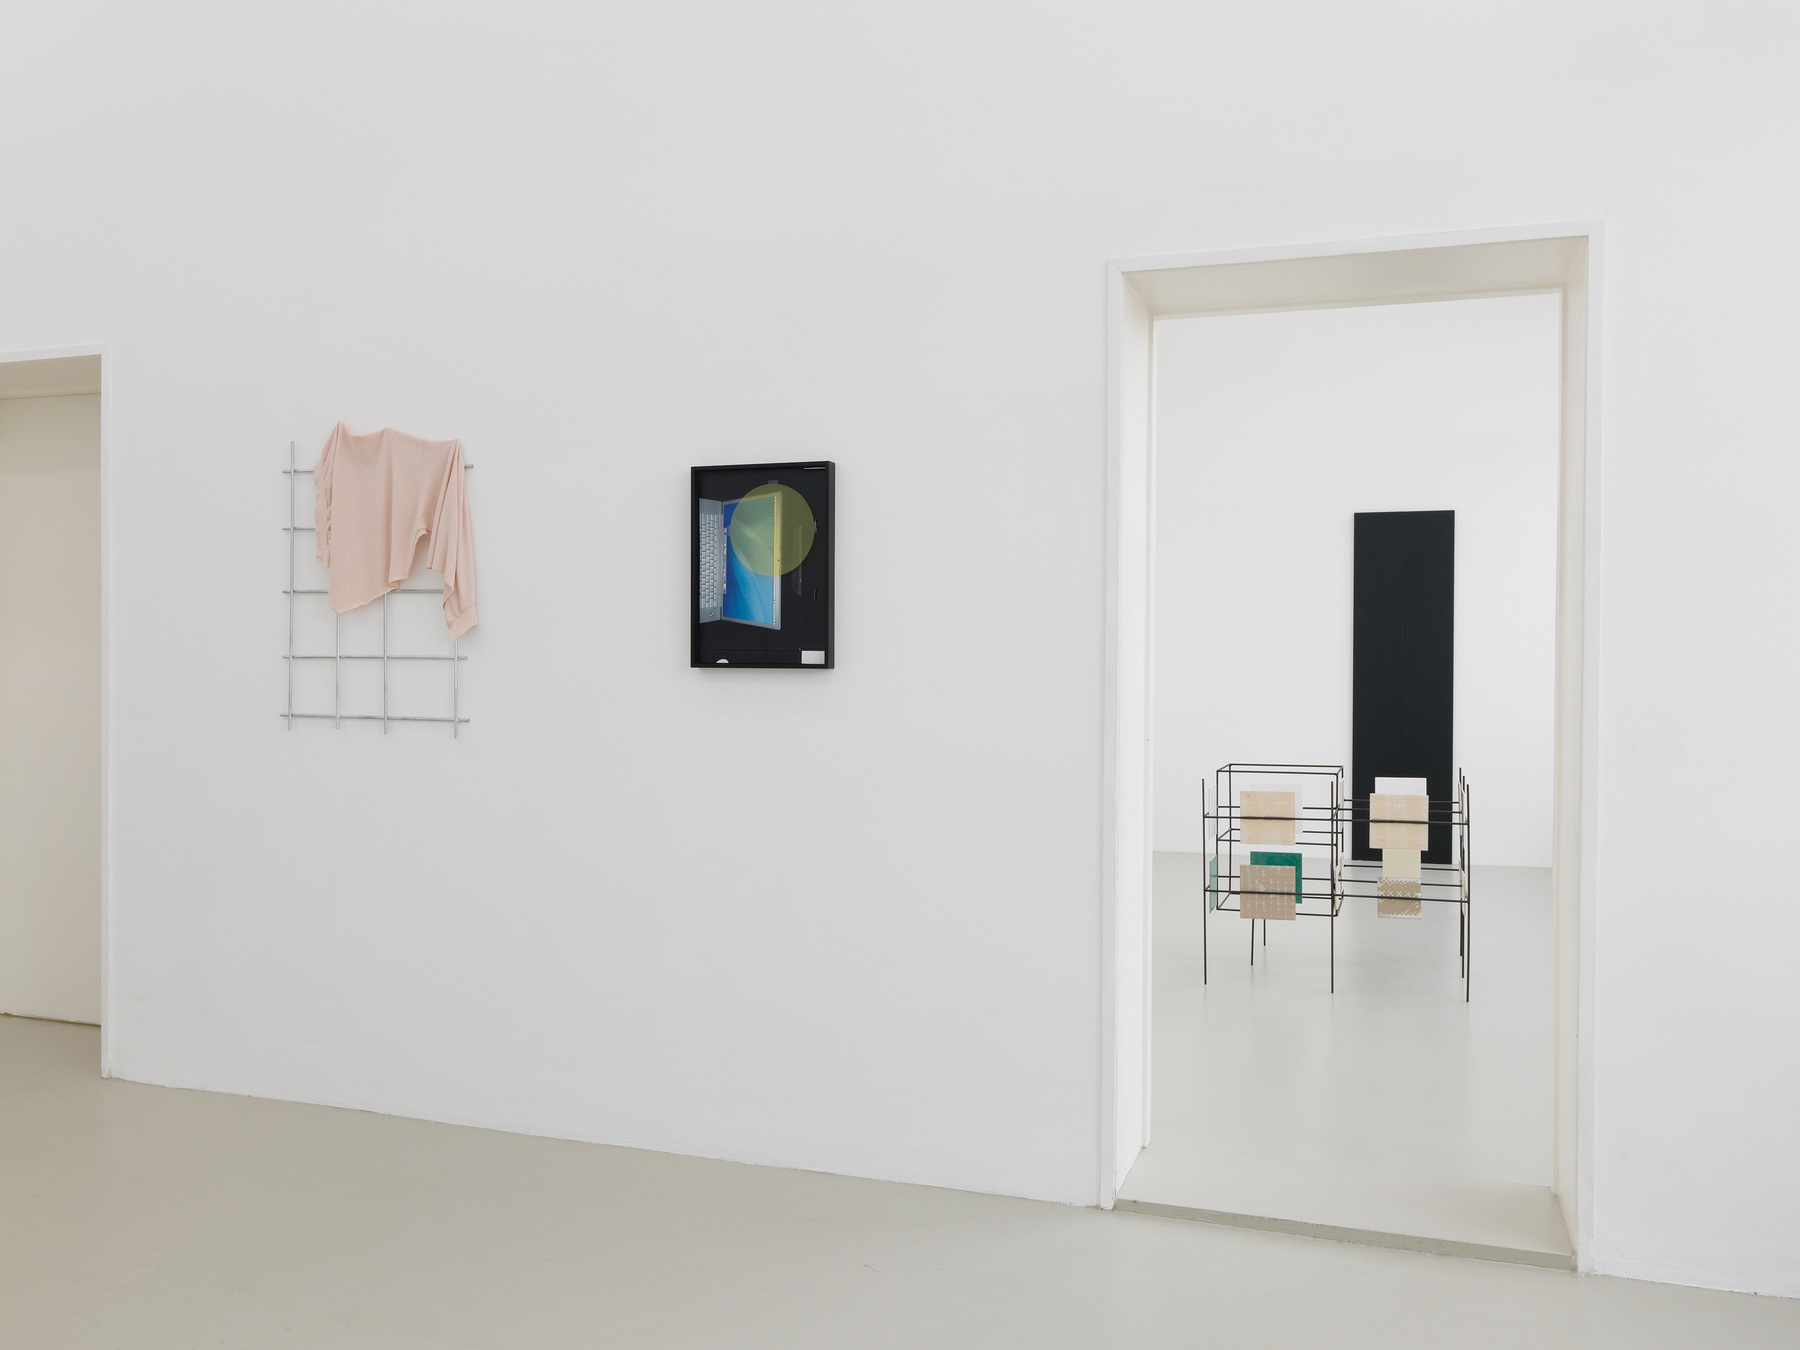 13_Edit Oderbolz_Kunstverein Nürnberg_2017